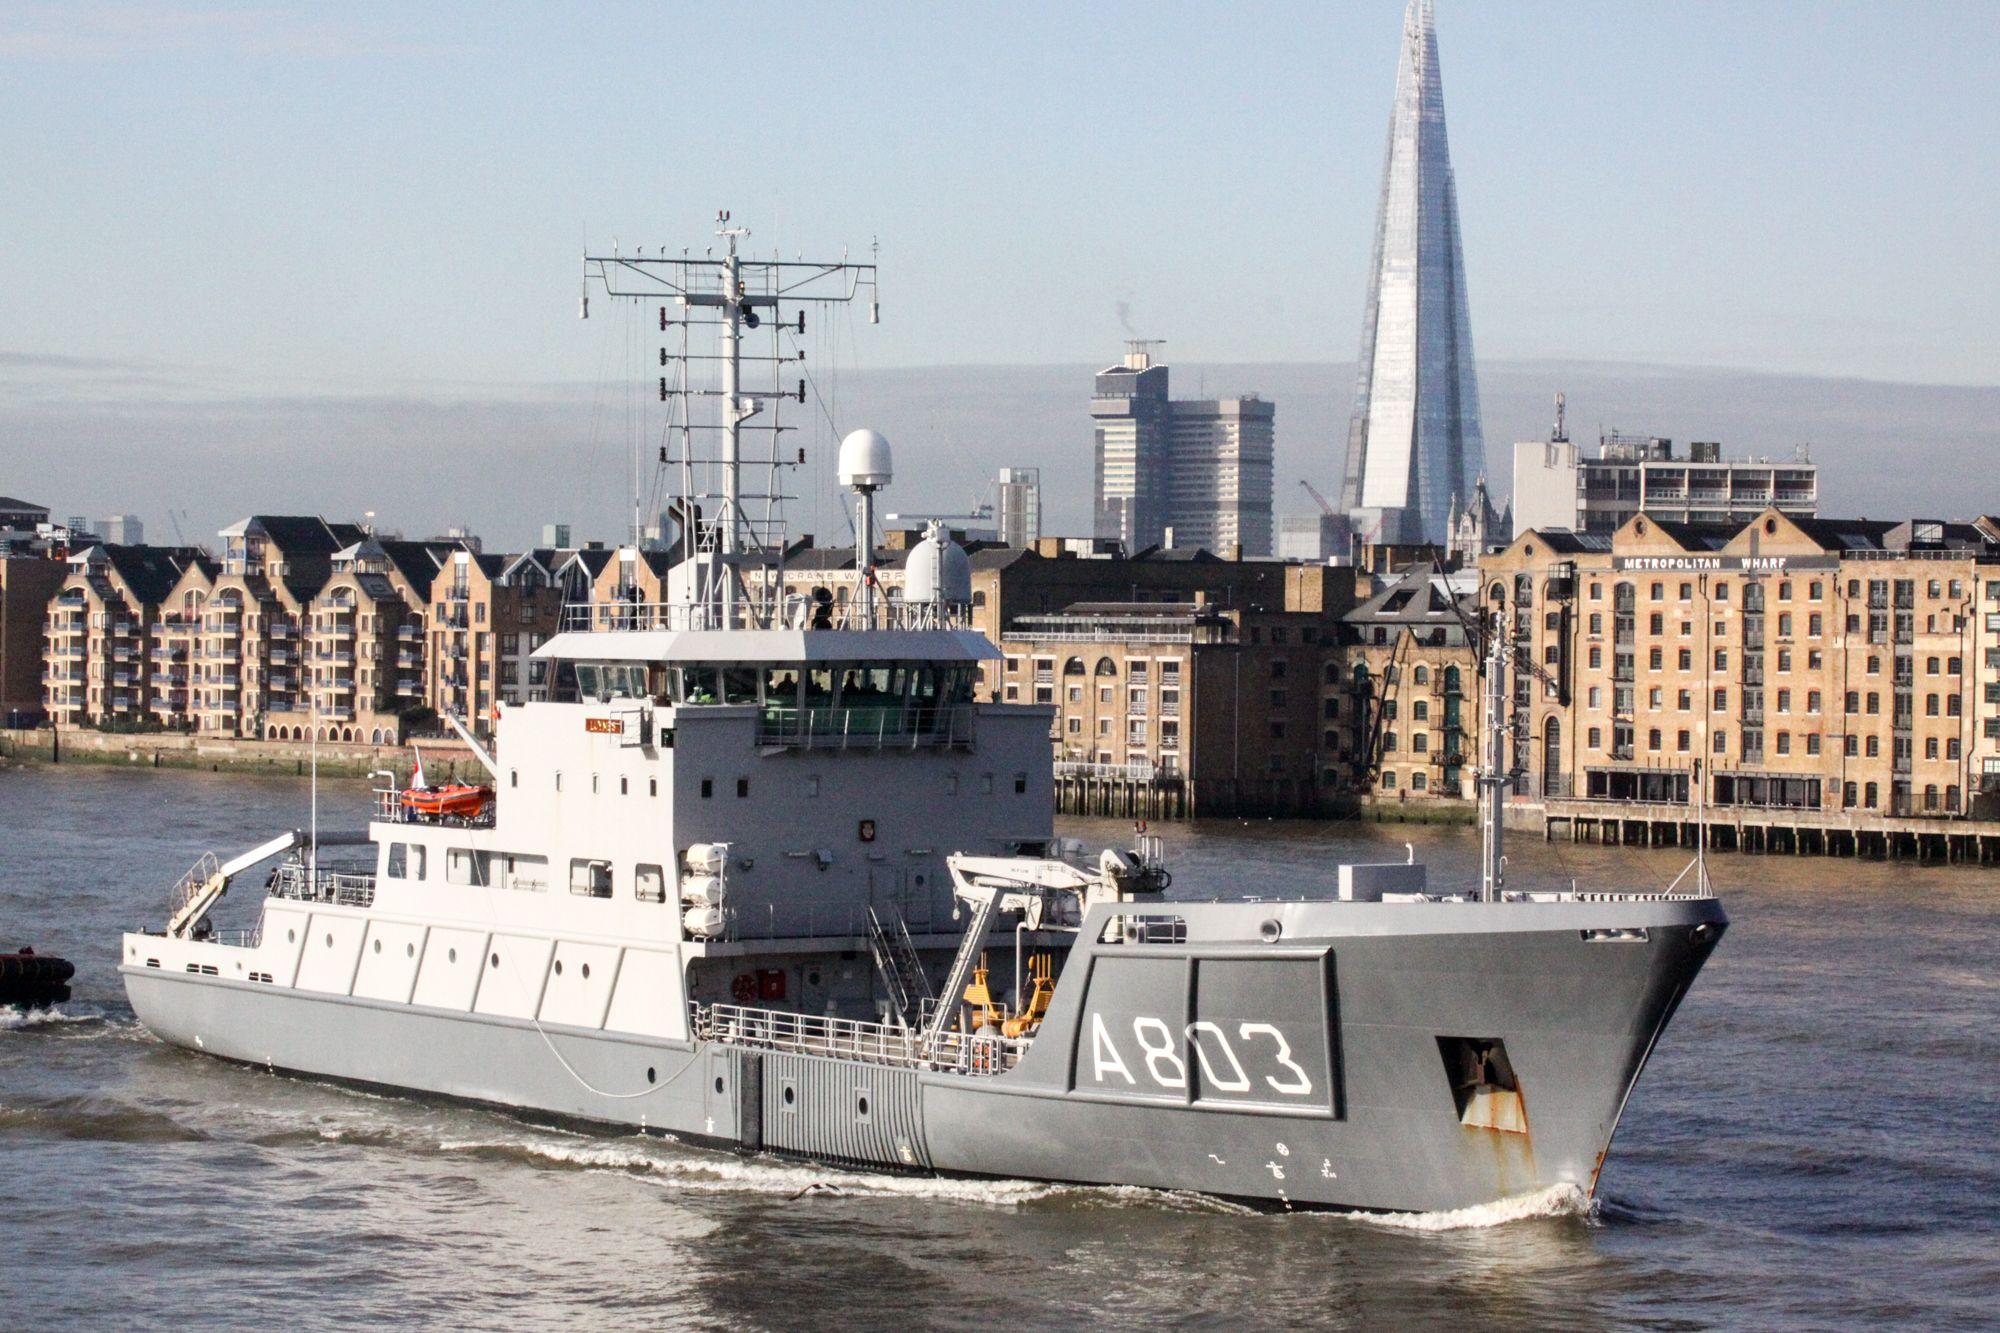 Dutch Navy auxiliary vessel.